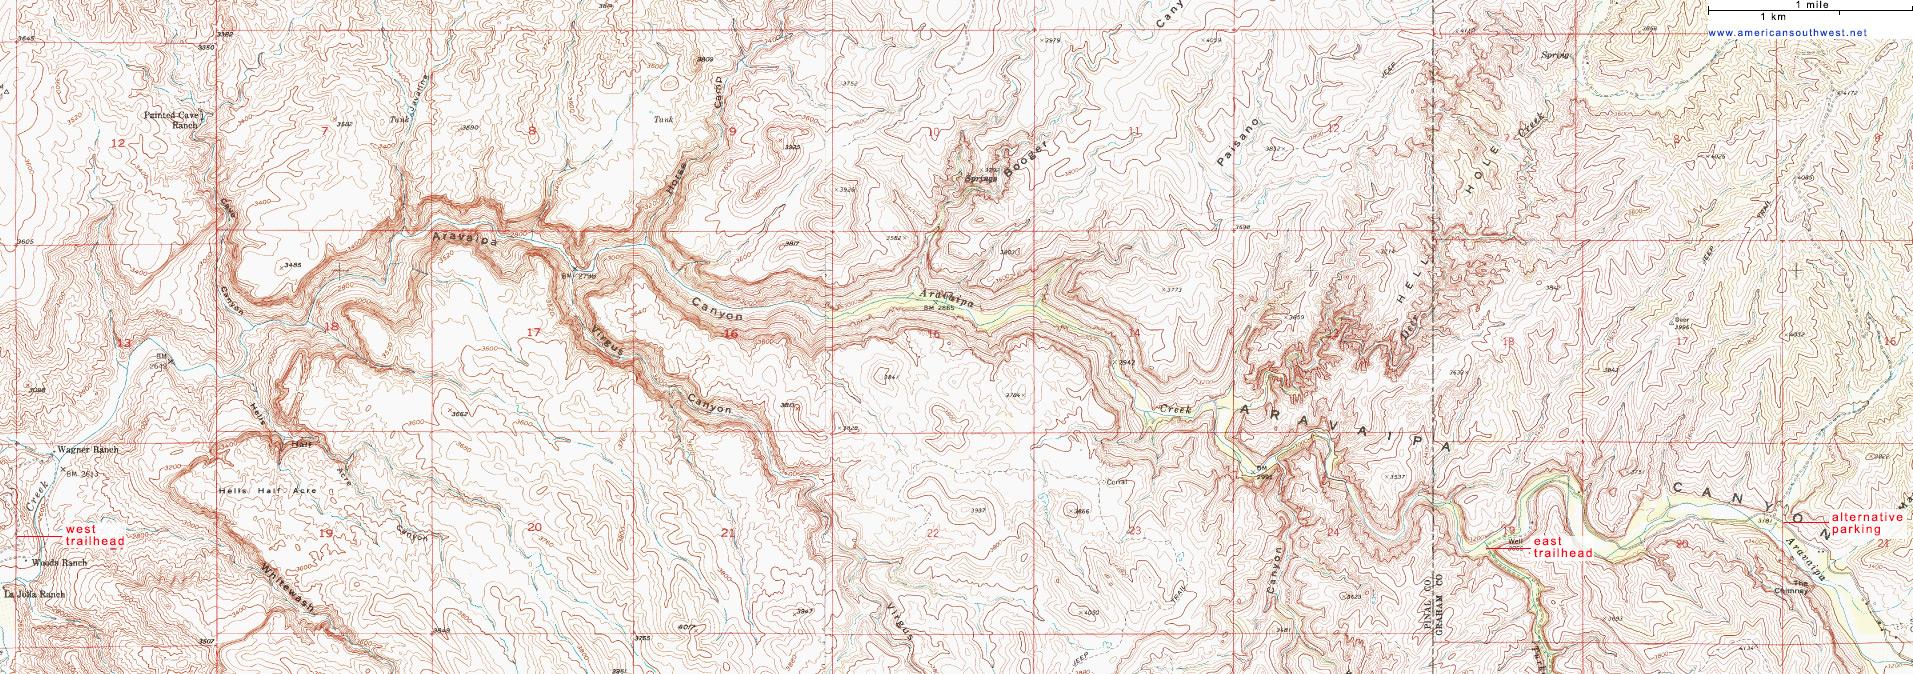 Topographic Map Of Aravaipa Canyon Arizona